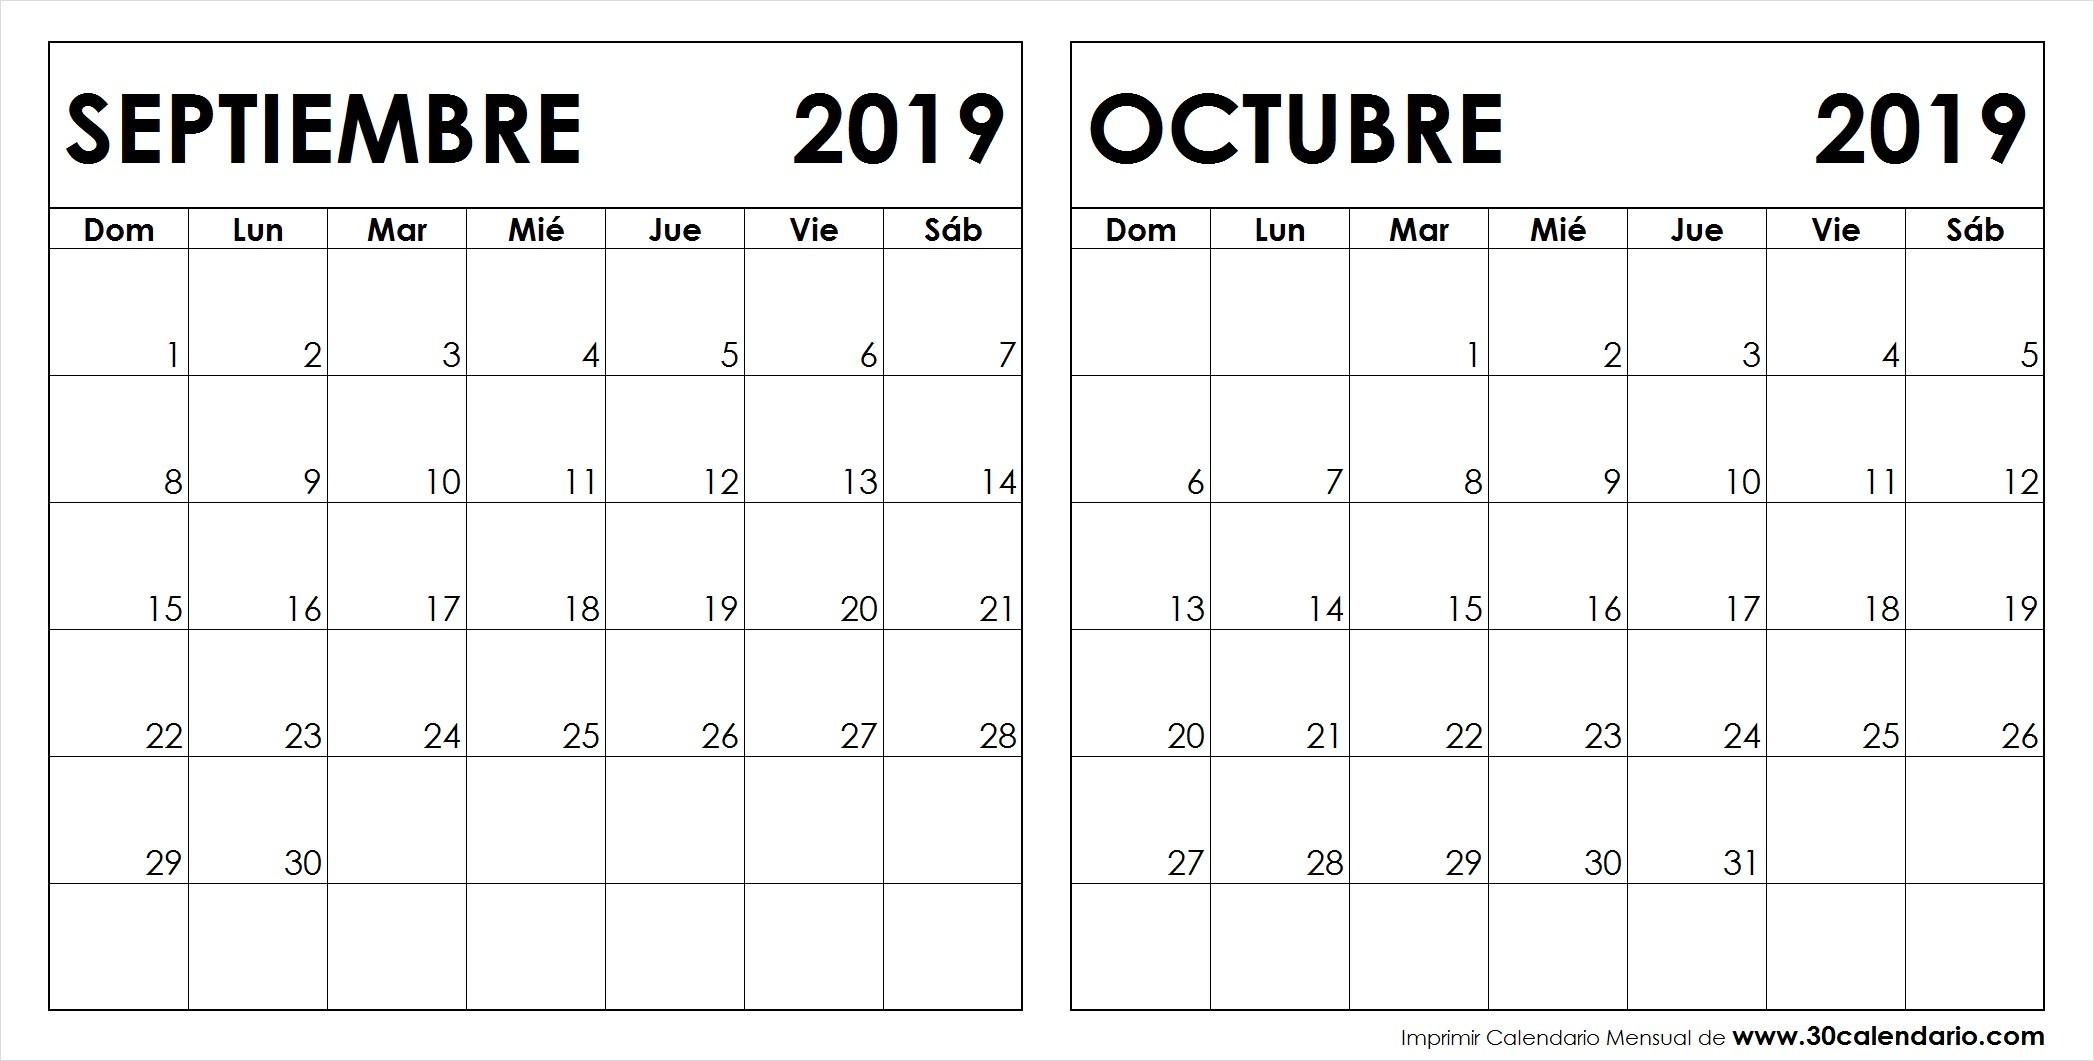 Calendario 2020 Con Festivos Guatemala Actual top 12 Calendario Mes De Septiembre Y Octubre 2019 Of Calendario 2020 Con Festivos Guatemala Más Arriba-a-fecha Quito 10 Diciembre 2015 [pdf Document]